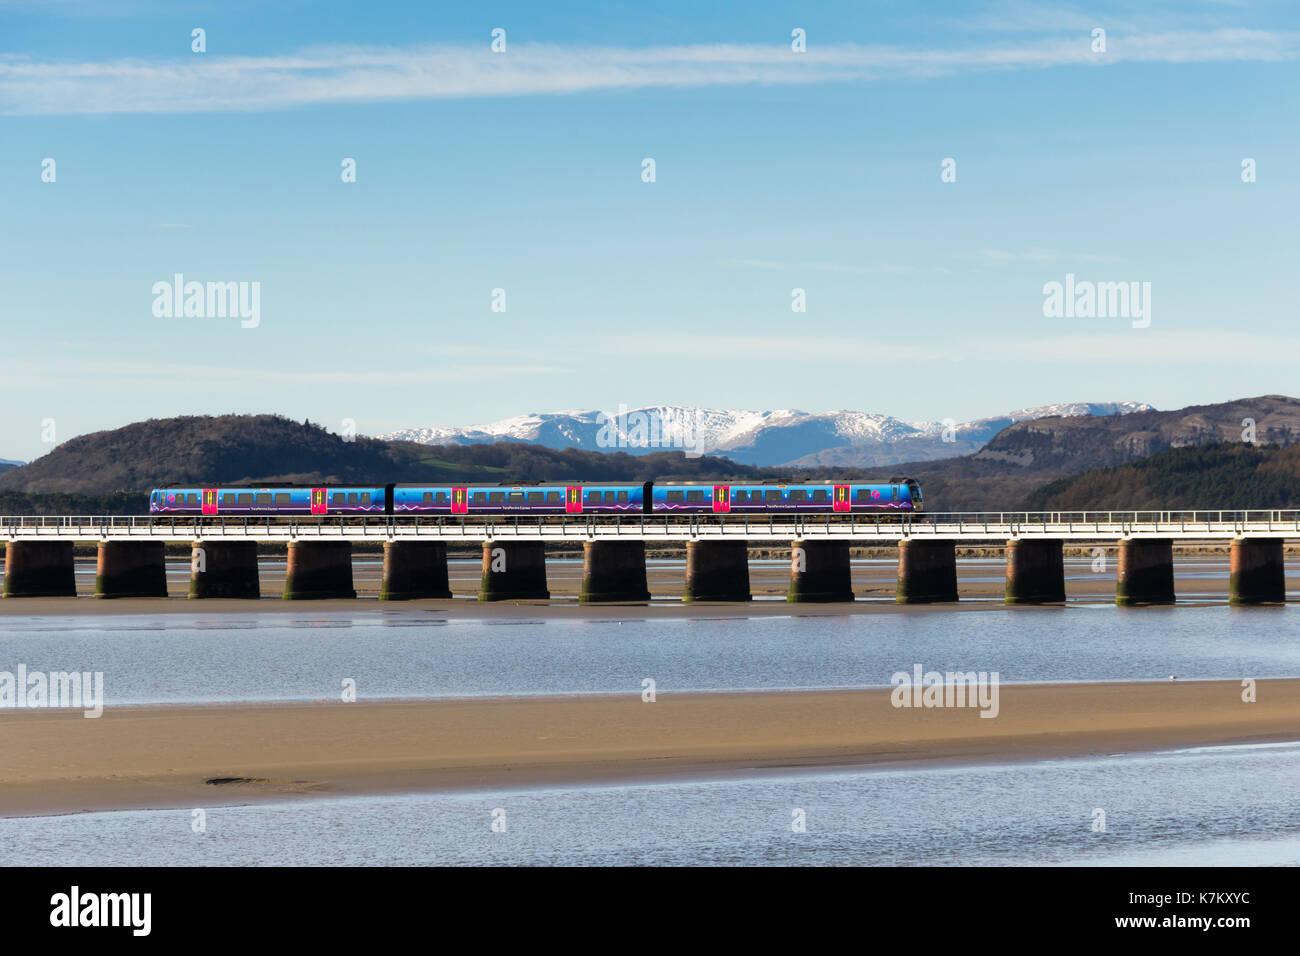 A First TransPennine Express Class 185 diesel multiple unit passenger train crossing Arnside railway viaduct over the river Kent - Stock Image